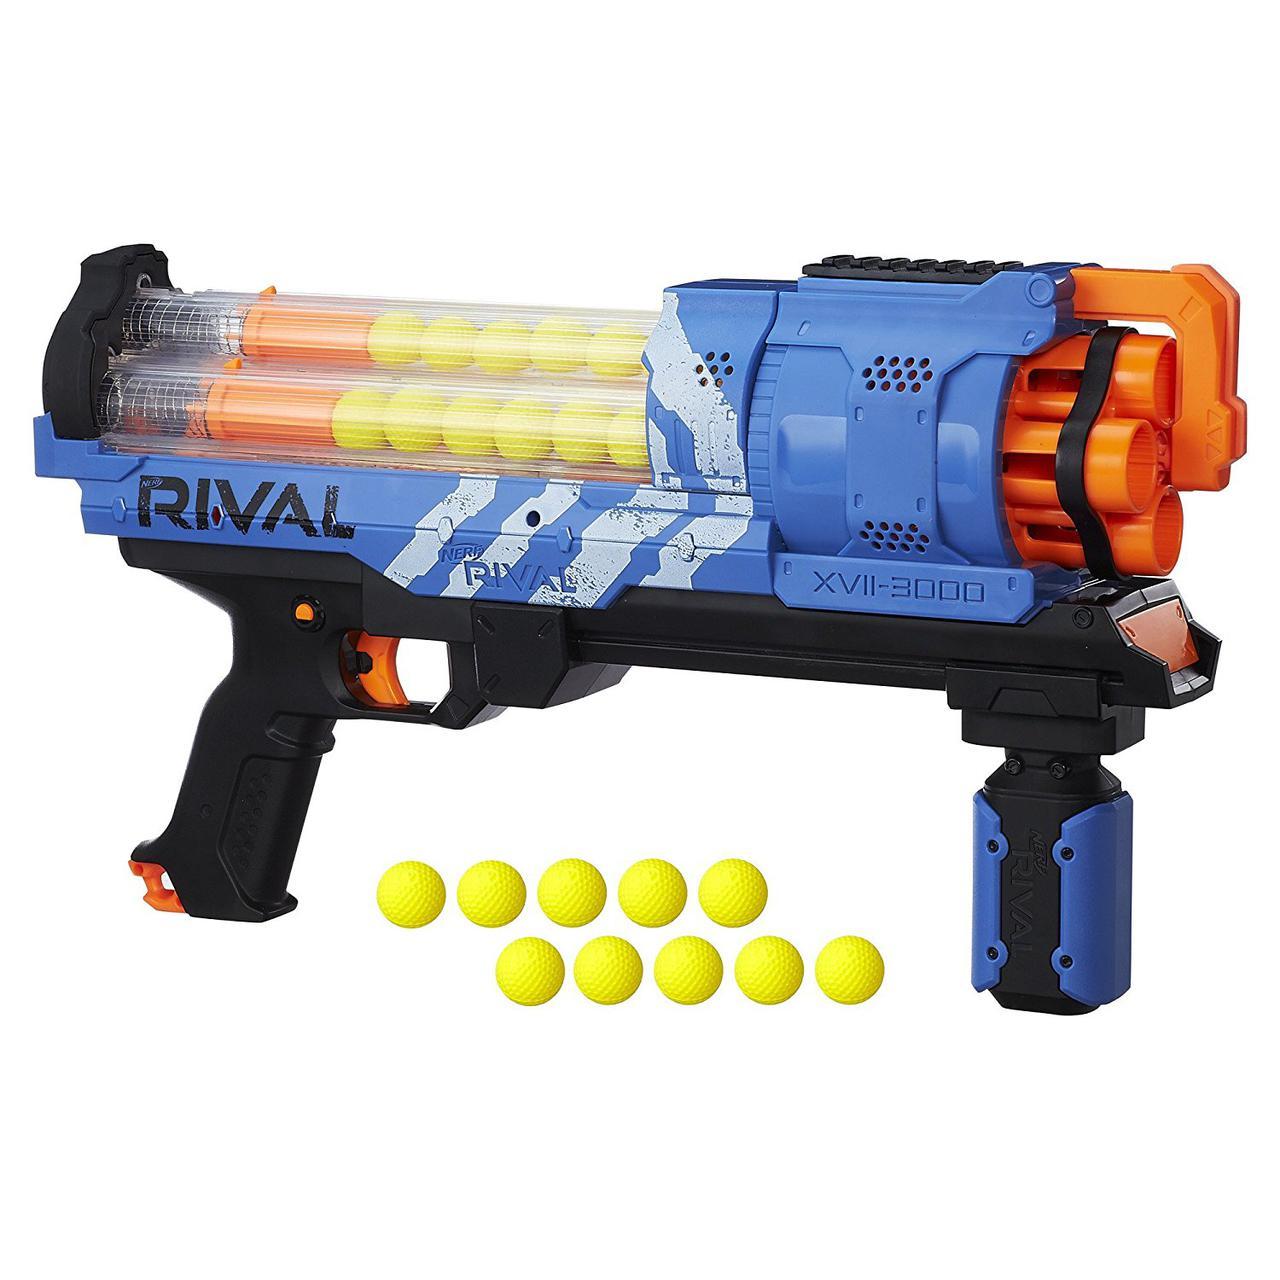 Hasbro Бластер Nerf Rival Artemis XVII-3000 Синий B8237